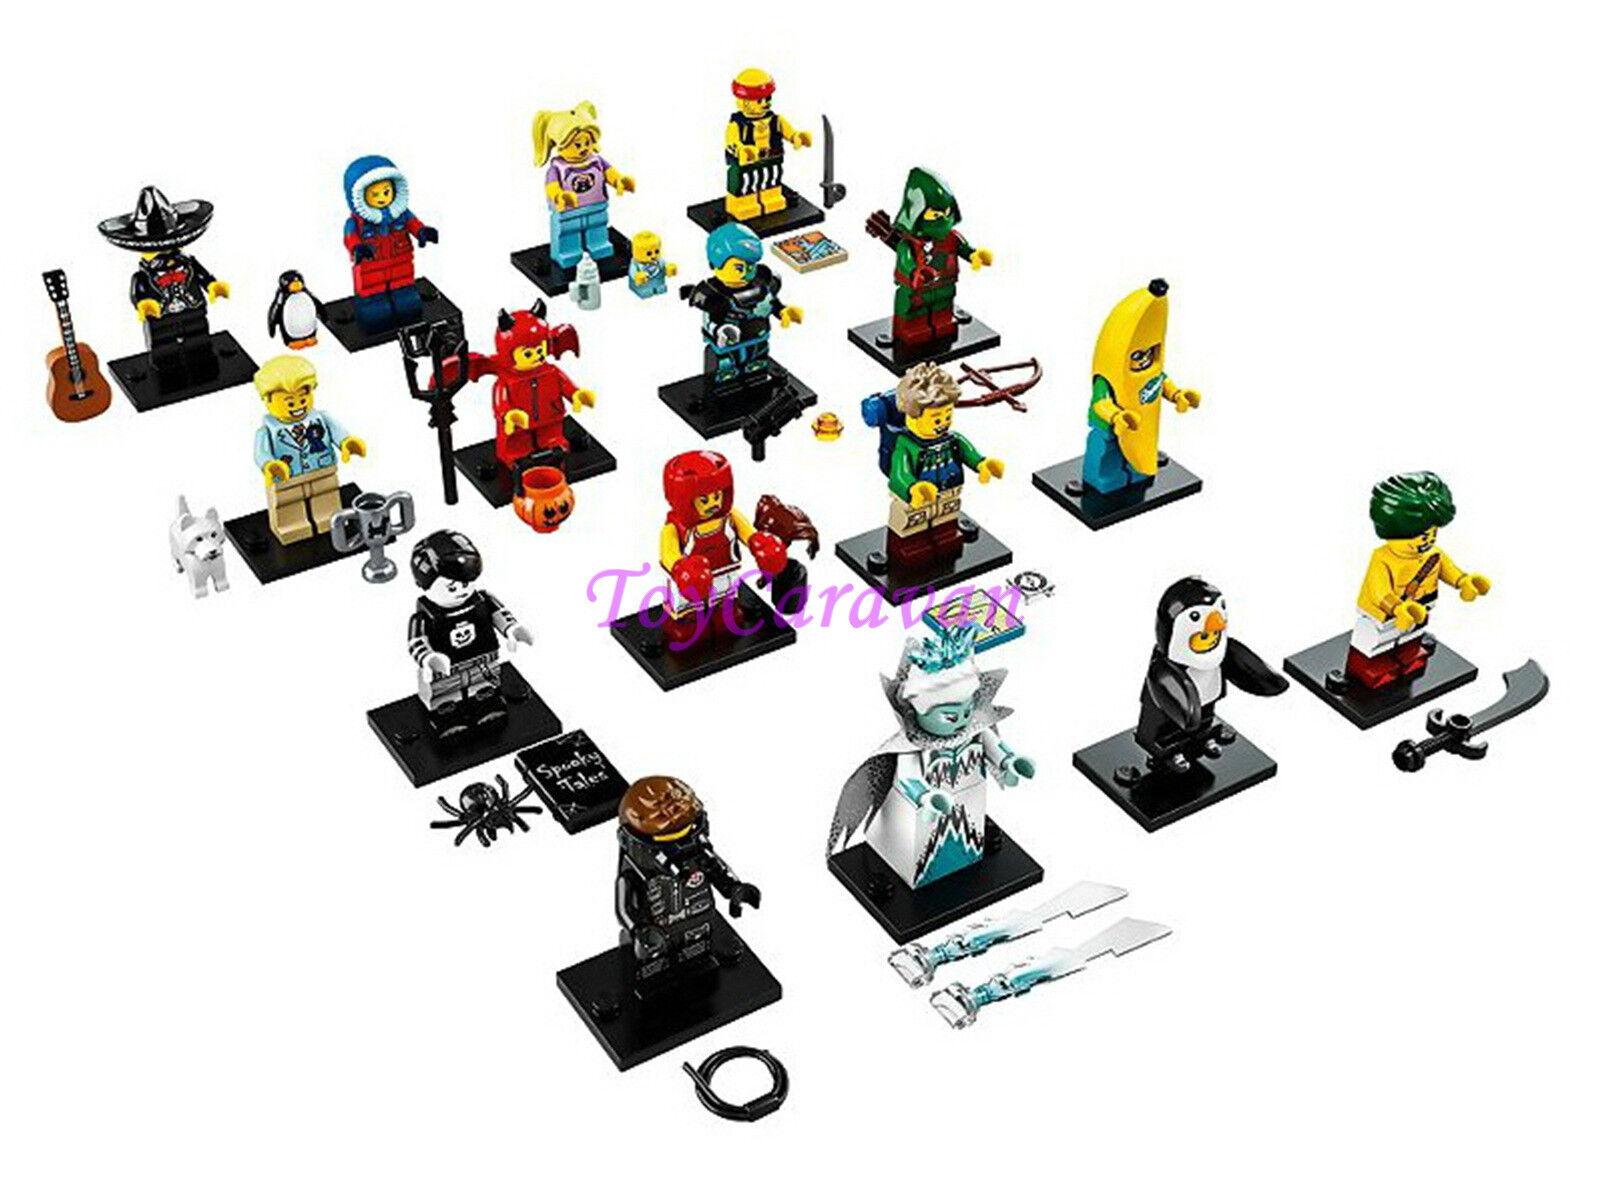 Lego Minifigures 71013 Minifigures Series 16 16 Figures Set New